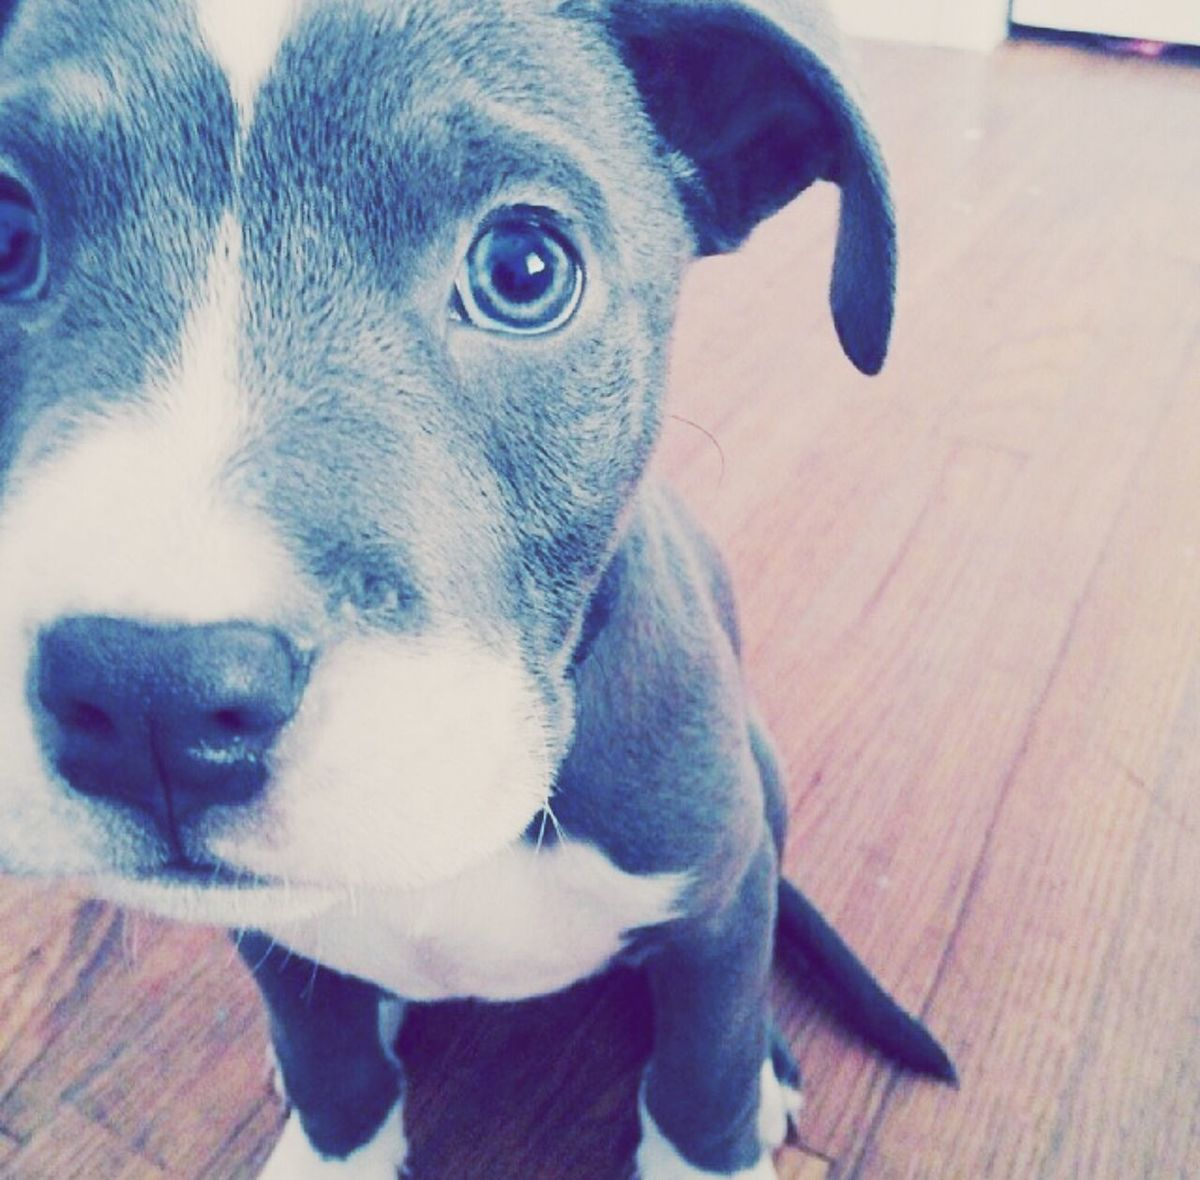 Puppy Pitbull Babypitbull Cutie